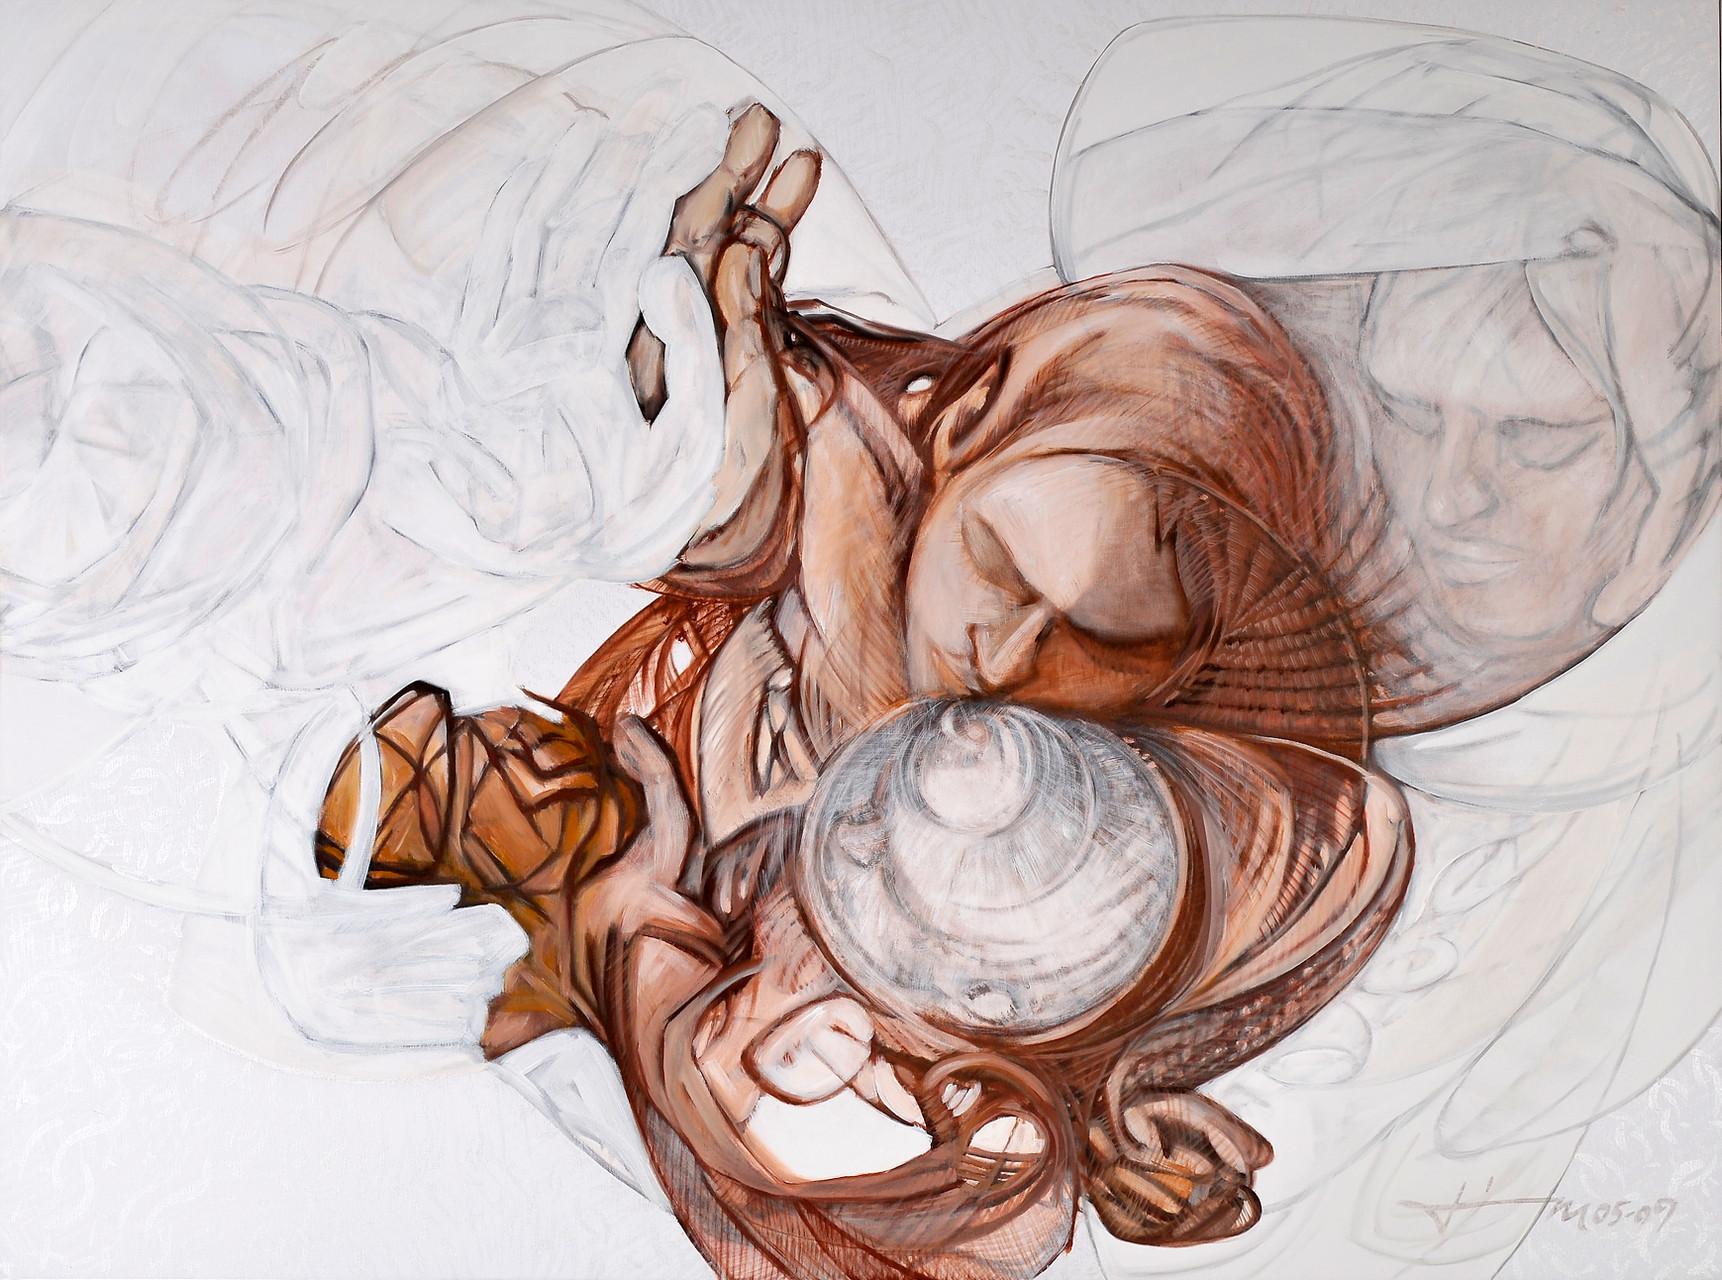 Vollkommenheit, Thomas M. Mayrhofer, 2005-2009, 195x145cm, Acryl auf Textil